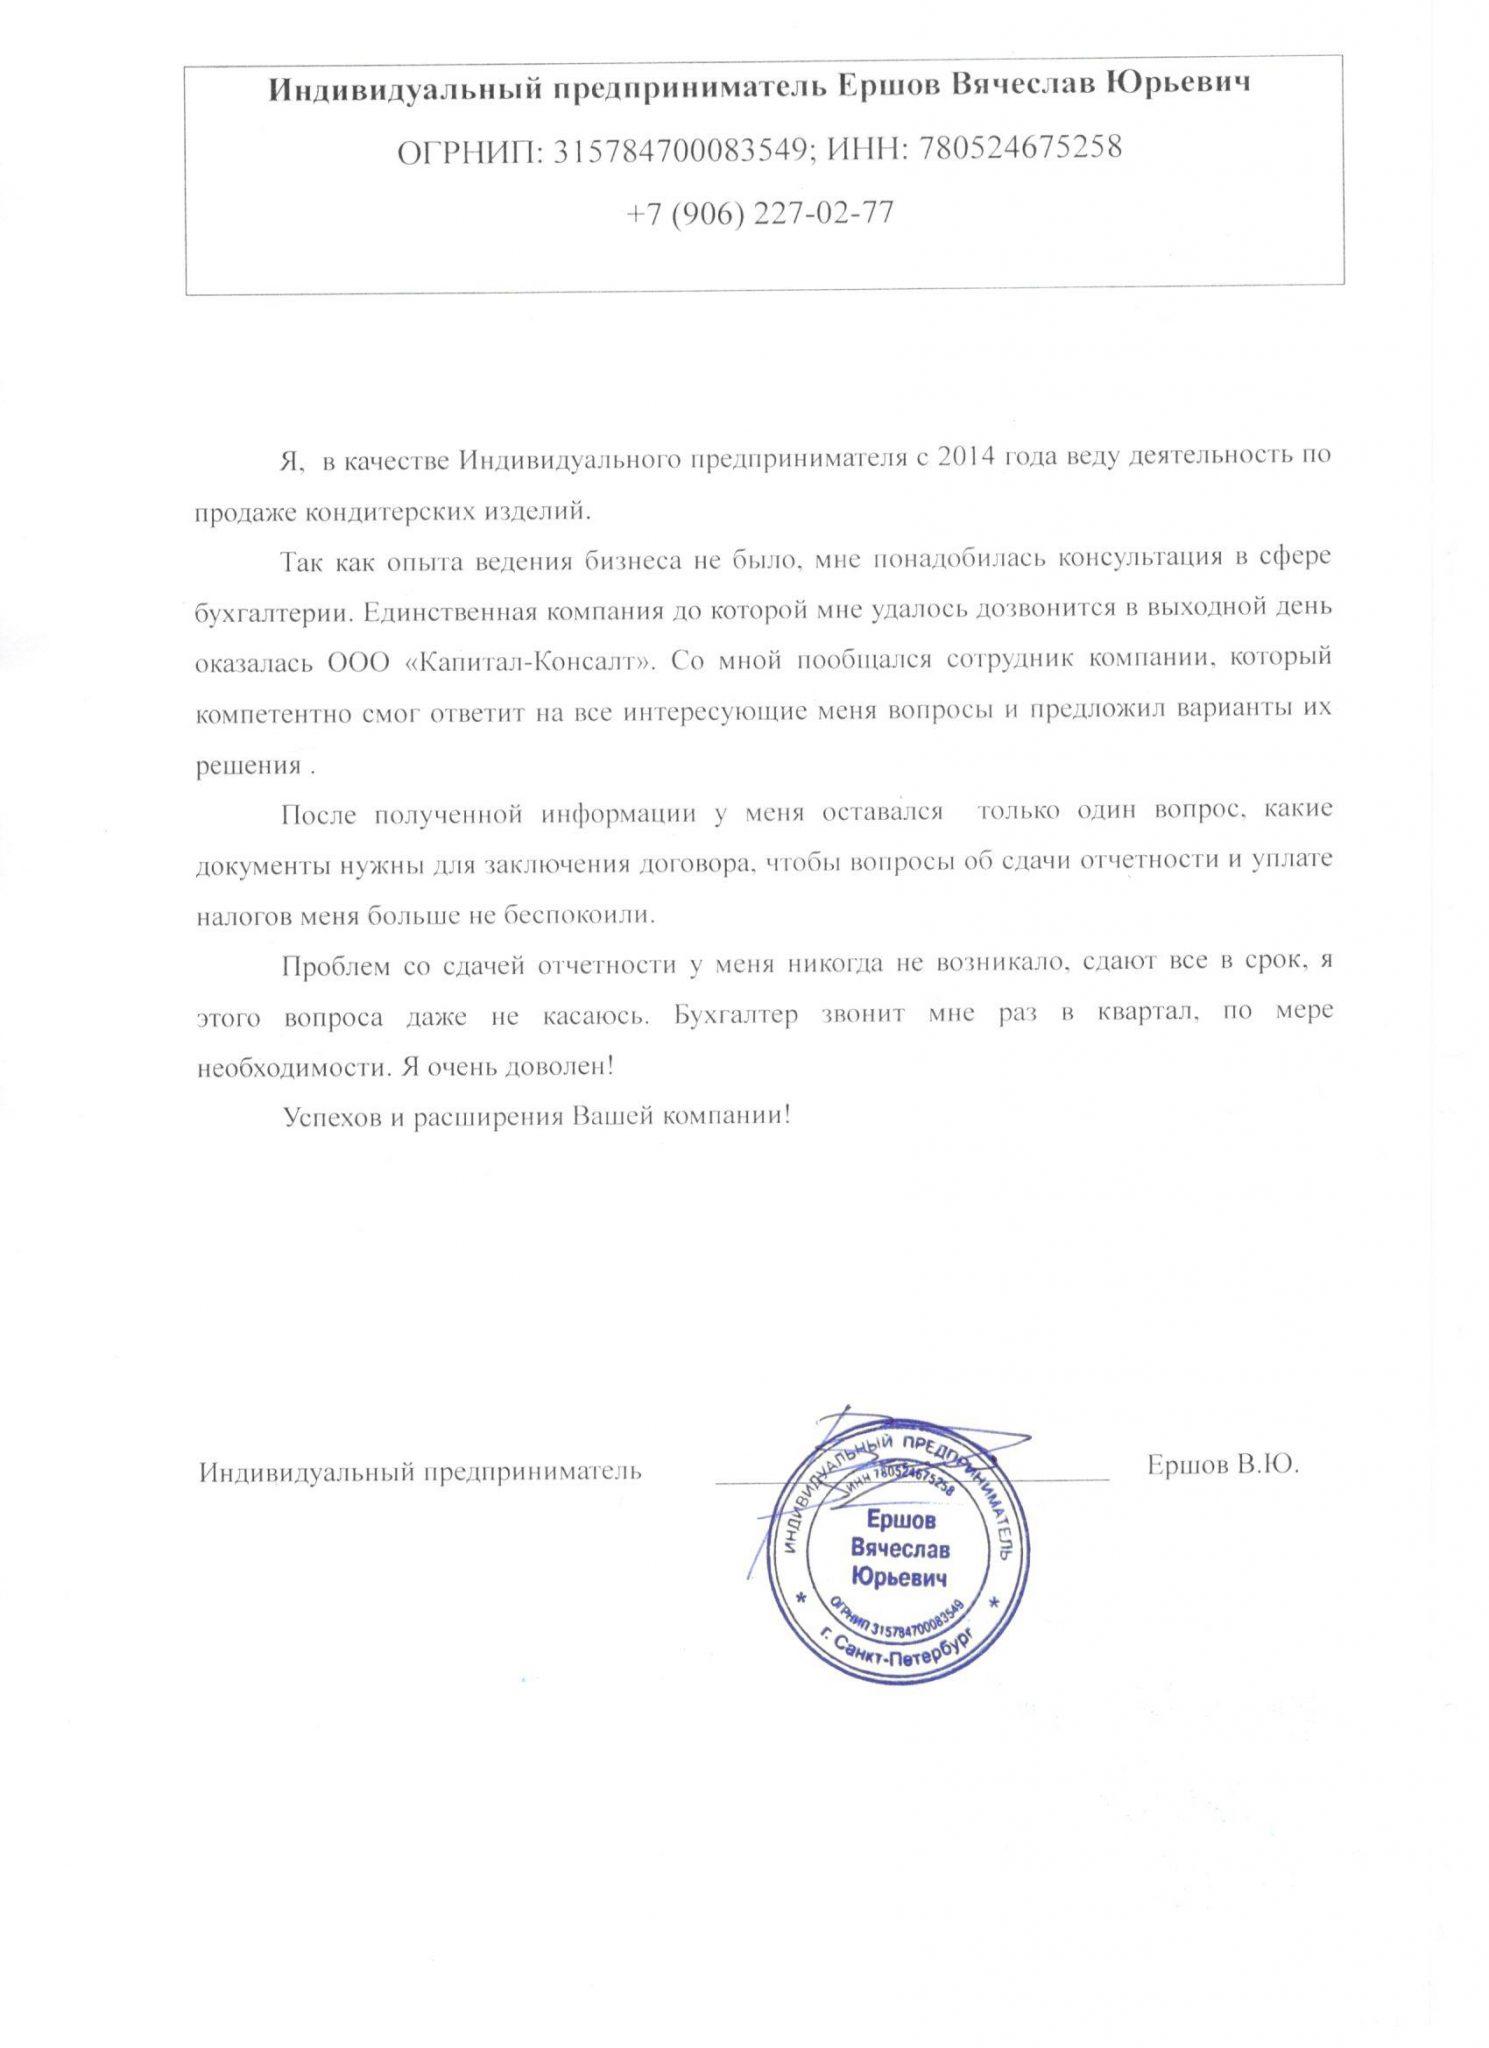 Ершов-ИП